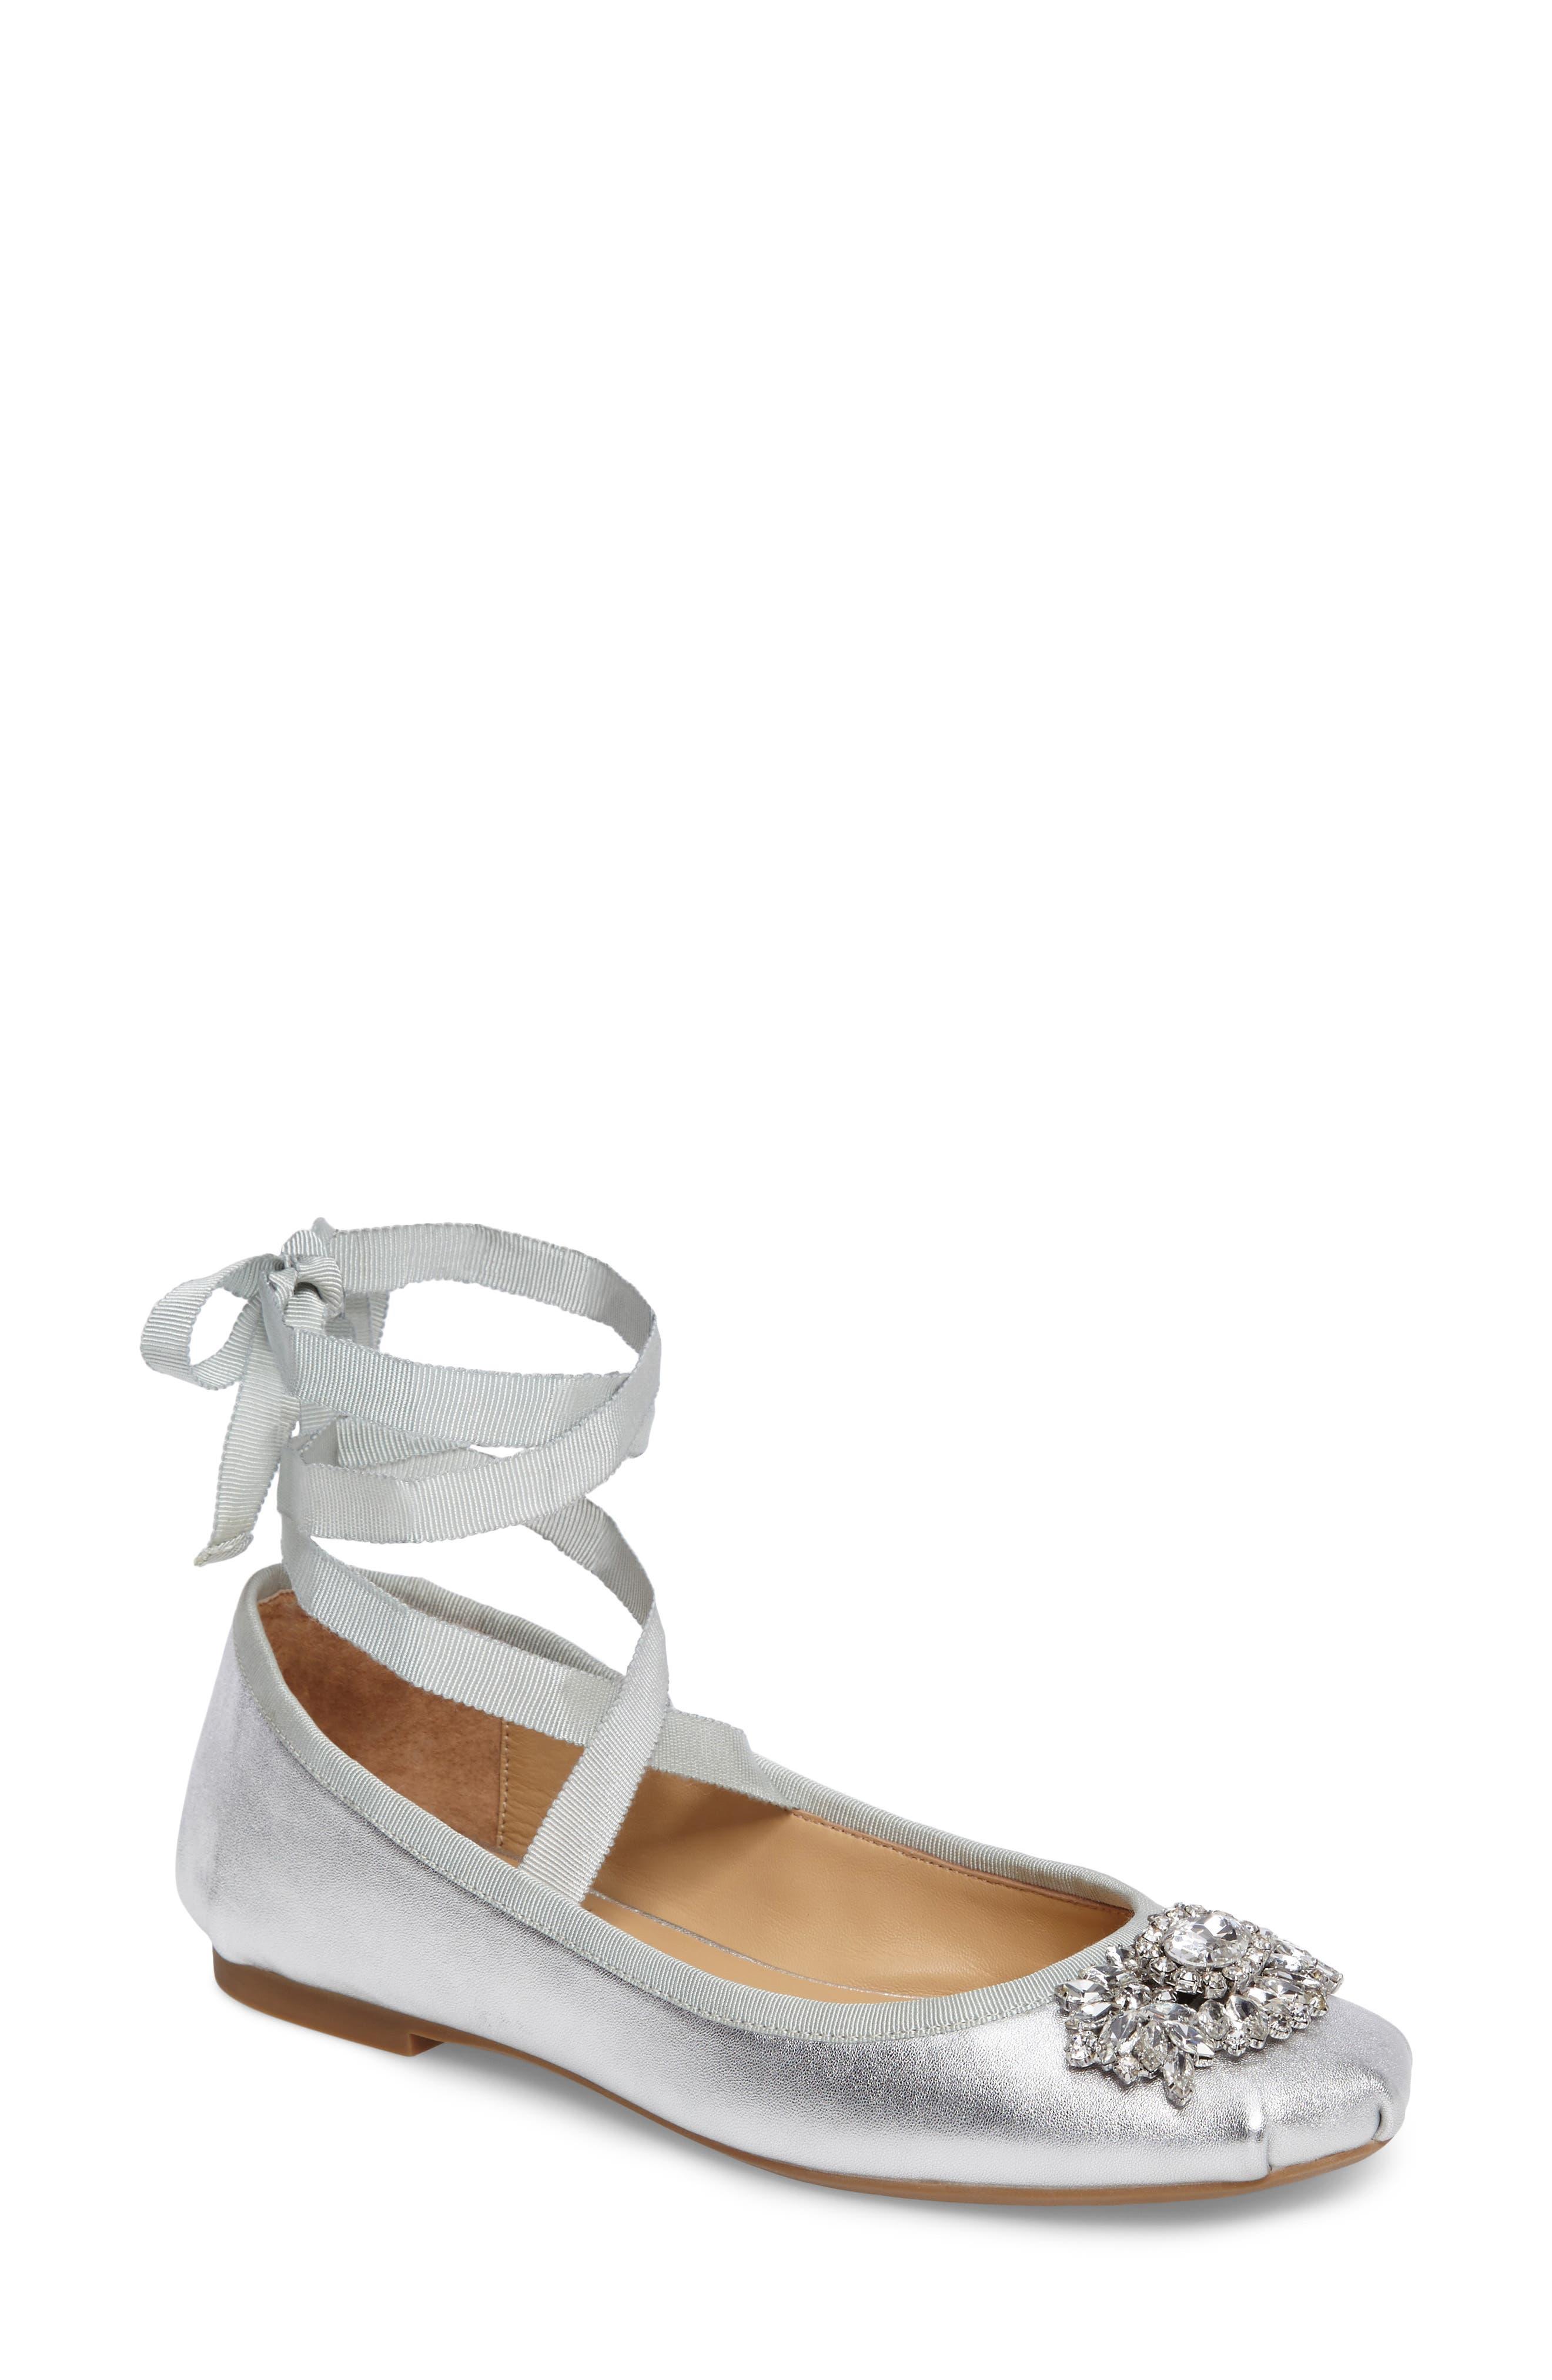 Badgley Mischka Karter II Embellished Ankle Wrap Ballet Flat (Women)